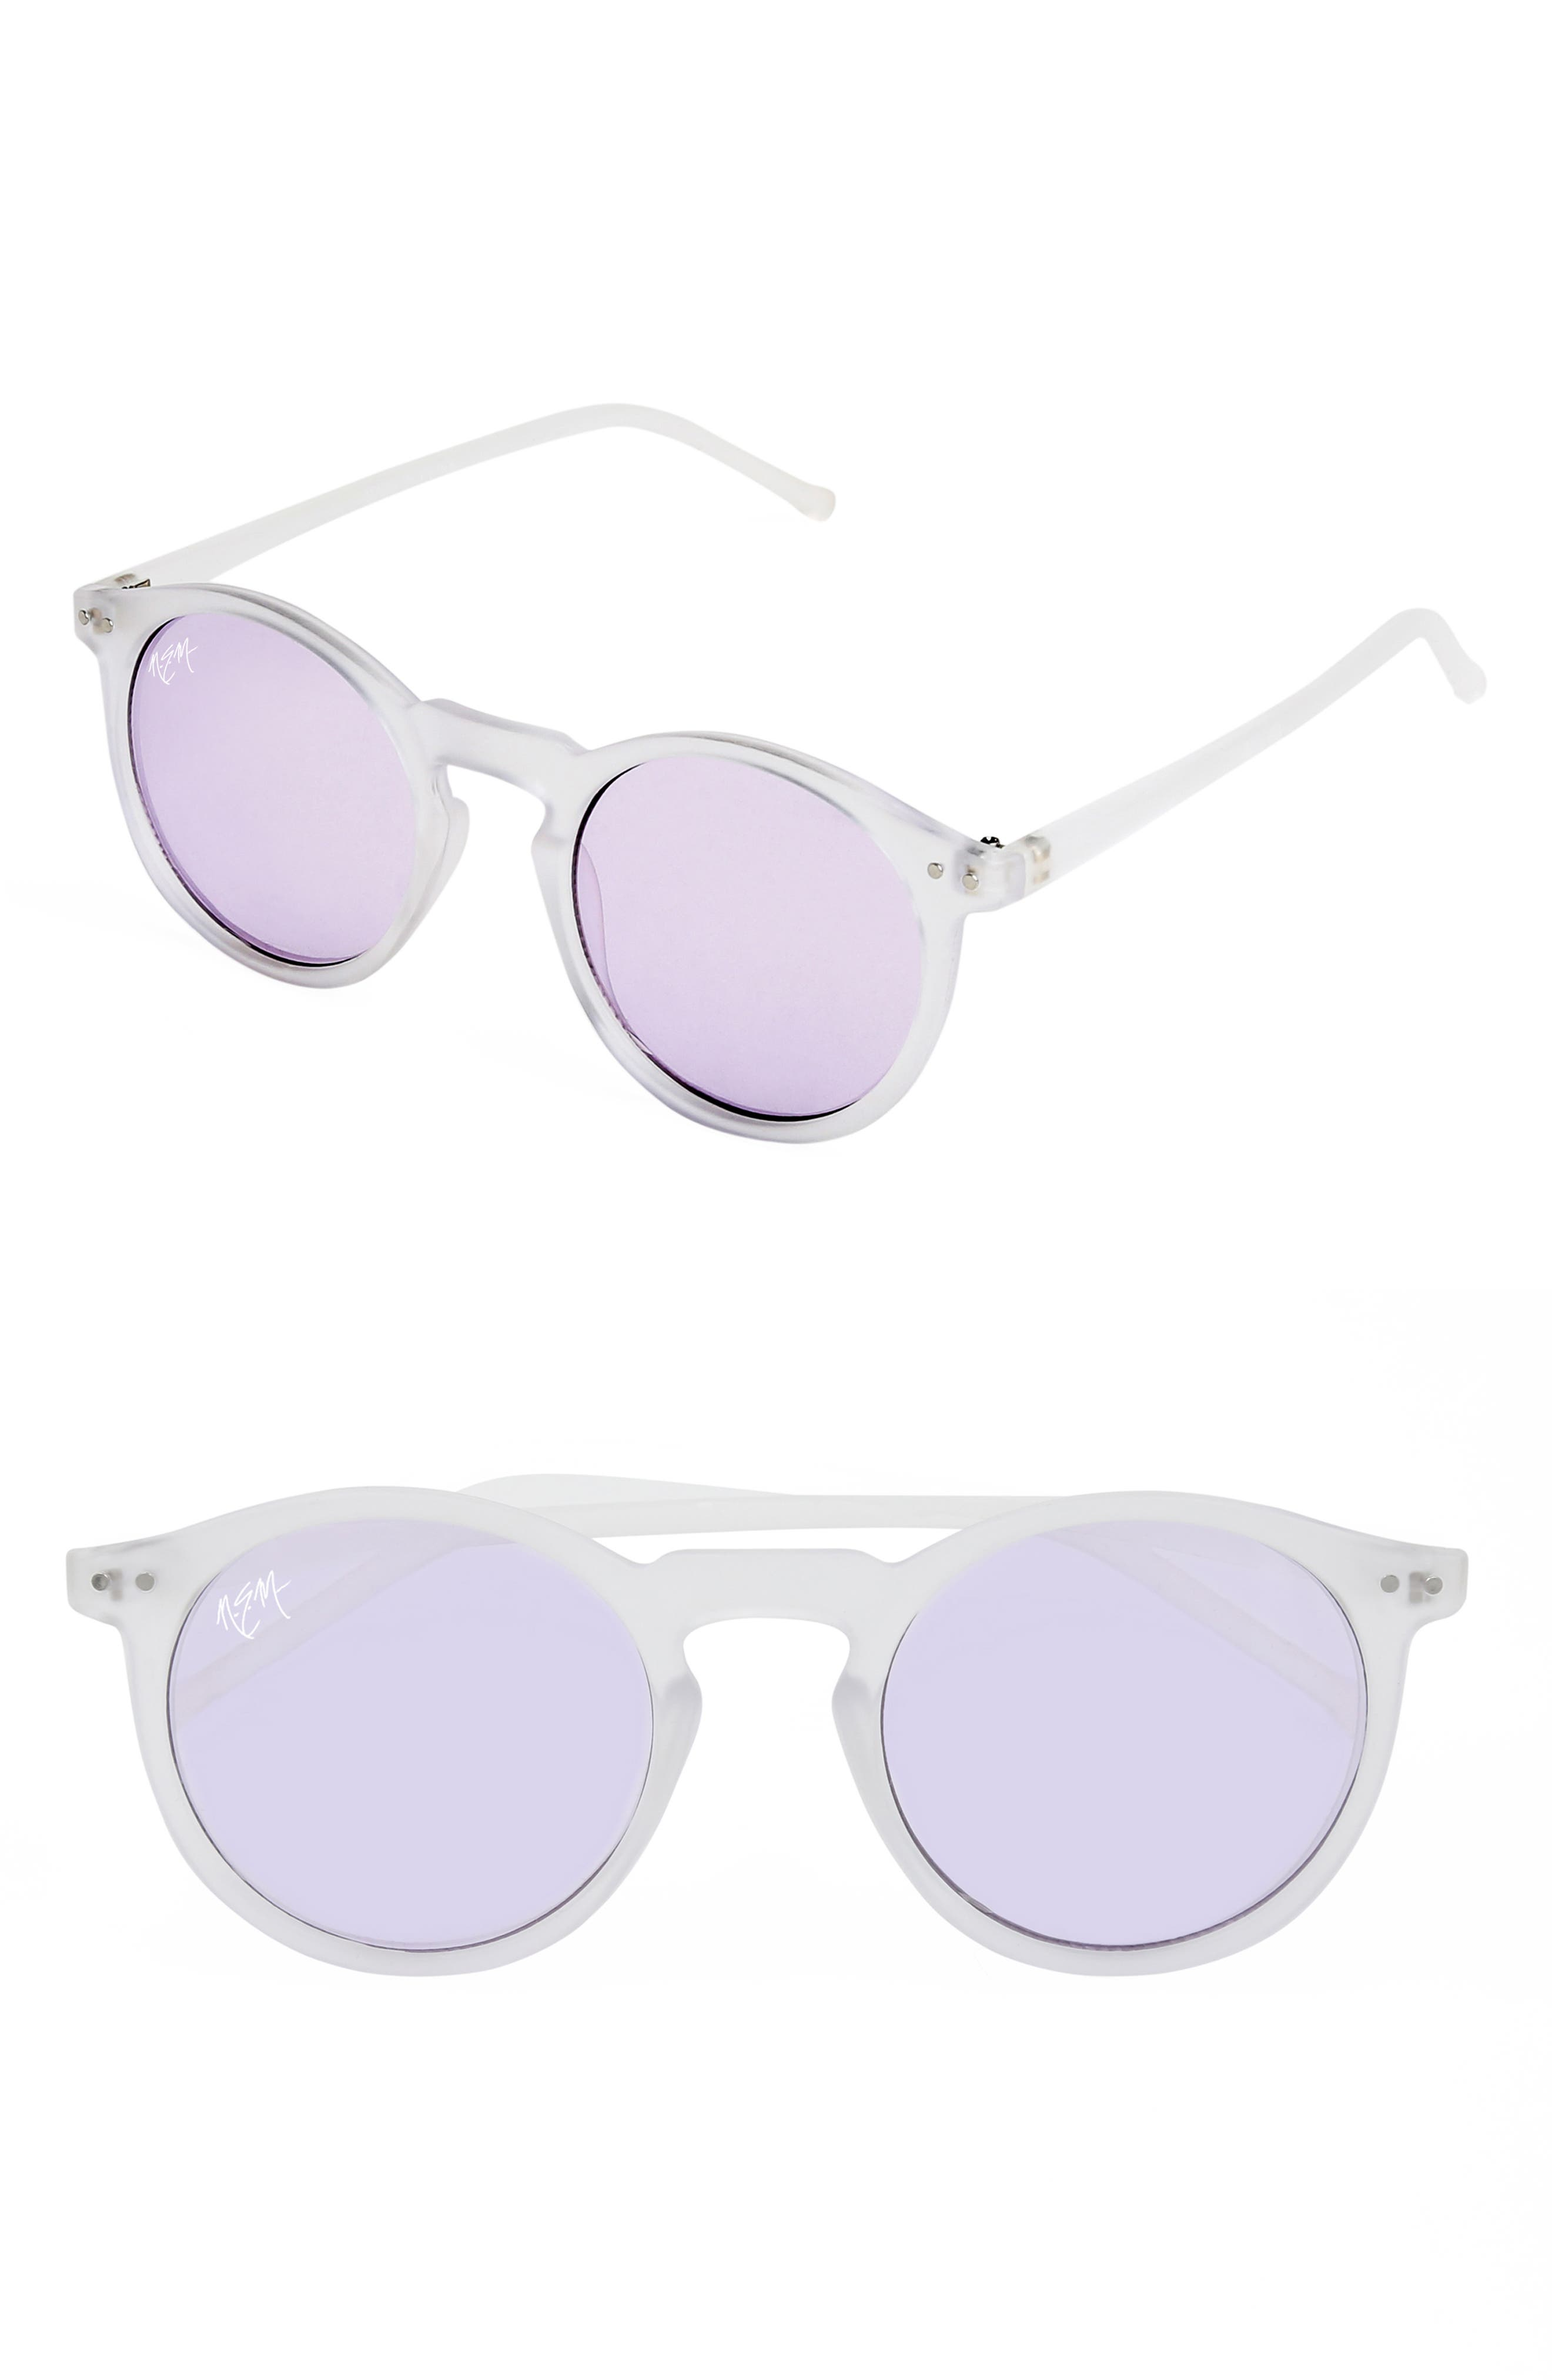 Nem 50Mm Mirrored Round Sunglasses - Clear Sky Blue/ Tint